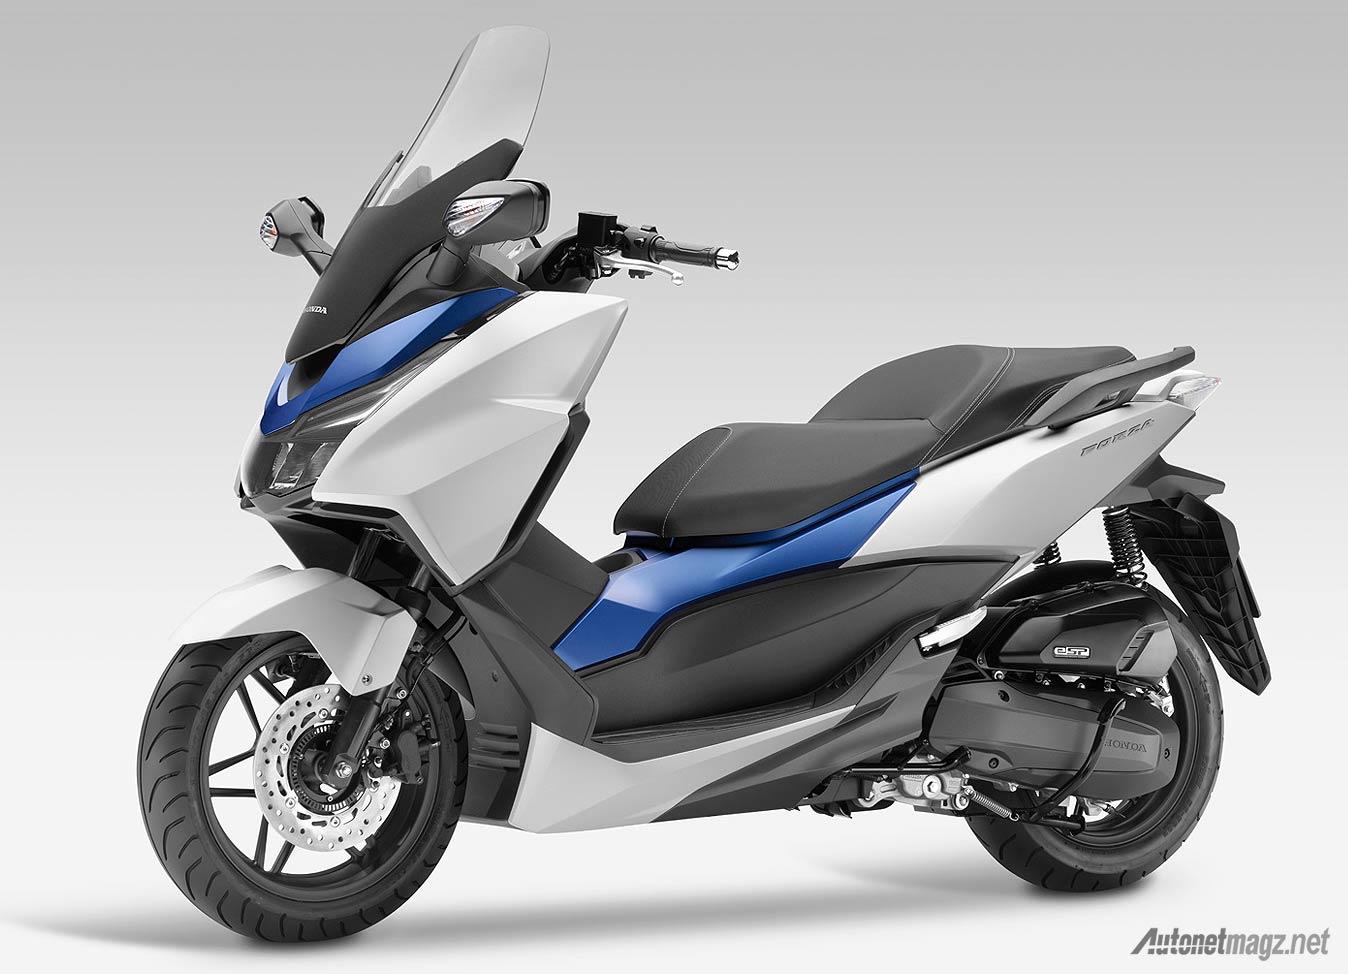 Skuter Turing Honda Forza 125 2015: Honda Forza 125, Cocok Juga Dijual